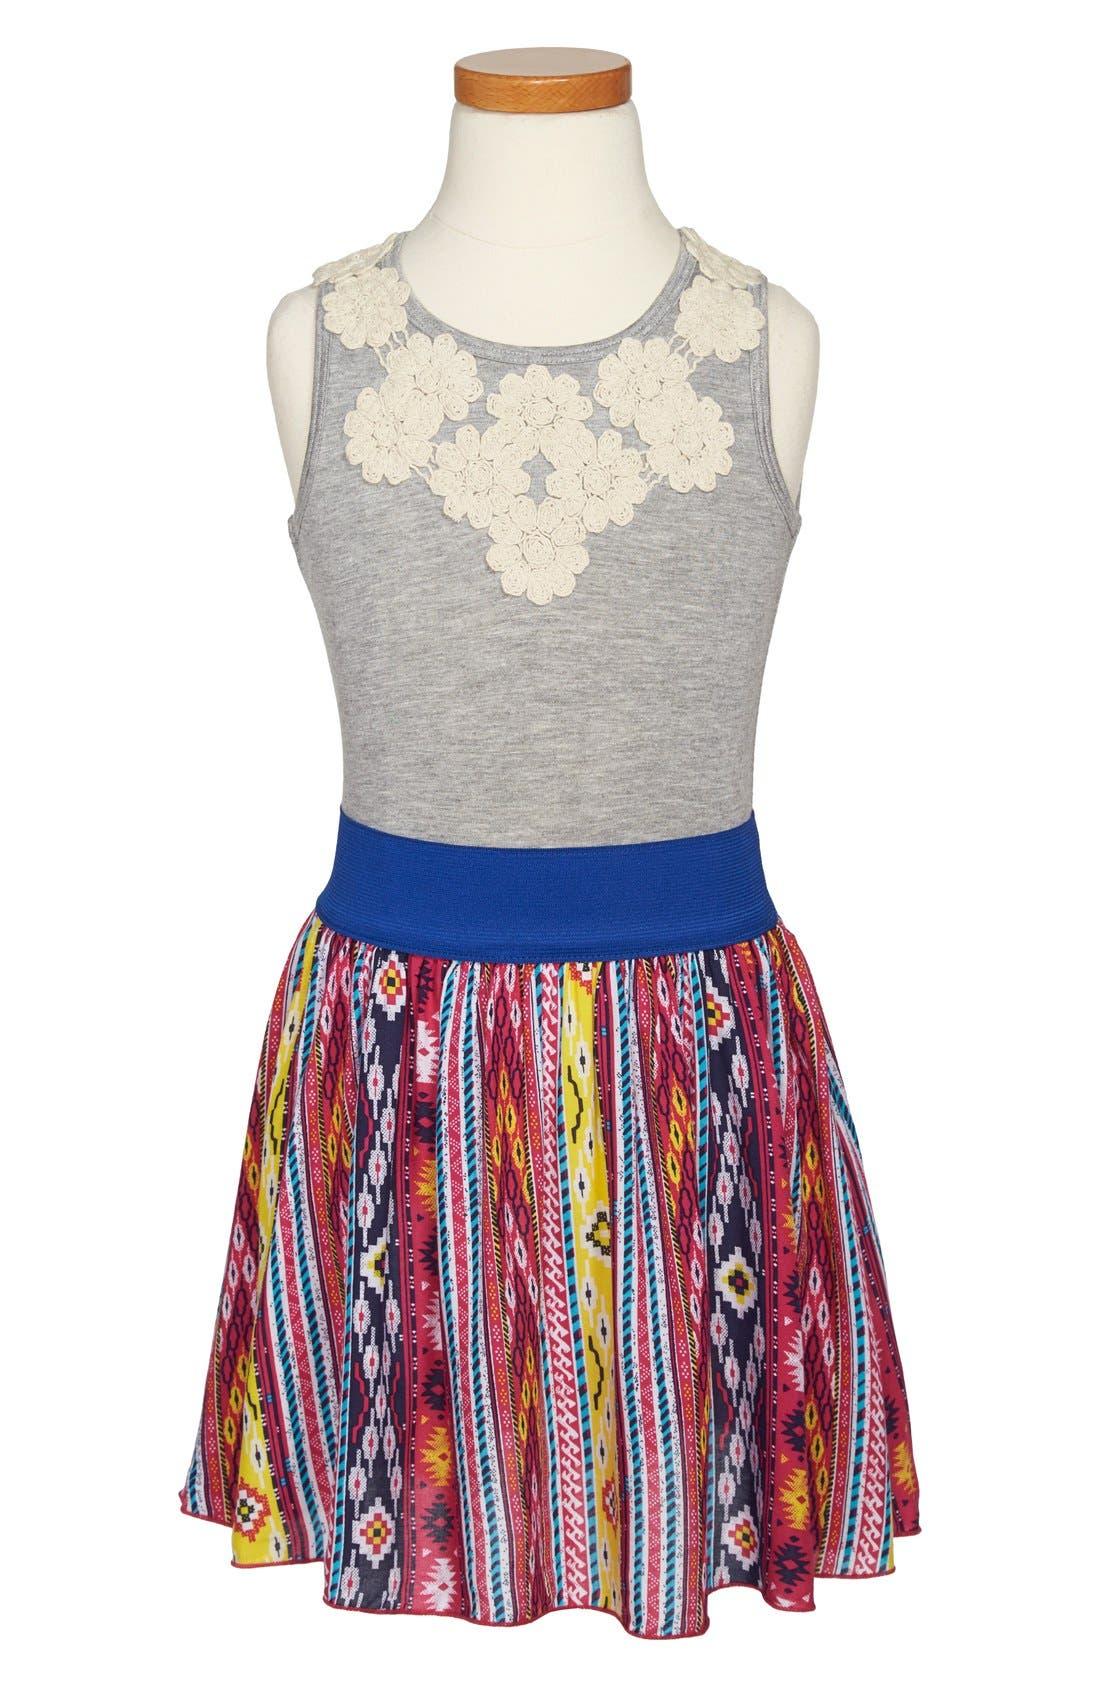 Main Image - Twirls & Twigs 'Cluney' Sleeveless Dress (Little Girls & Big Girls)